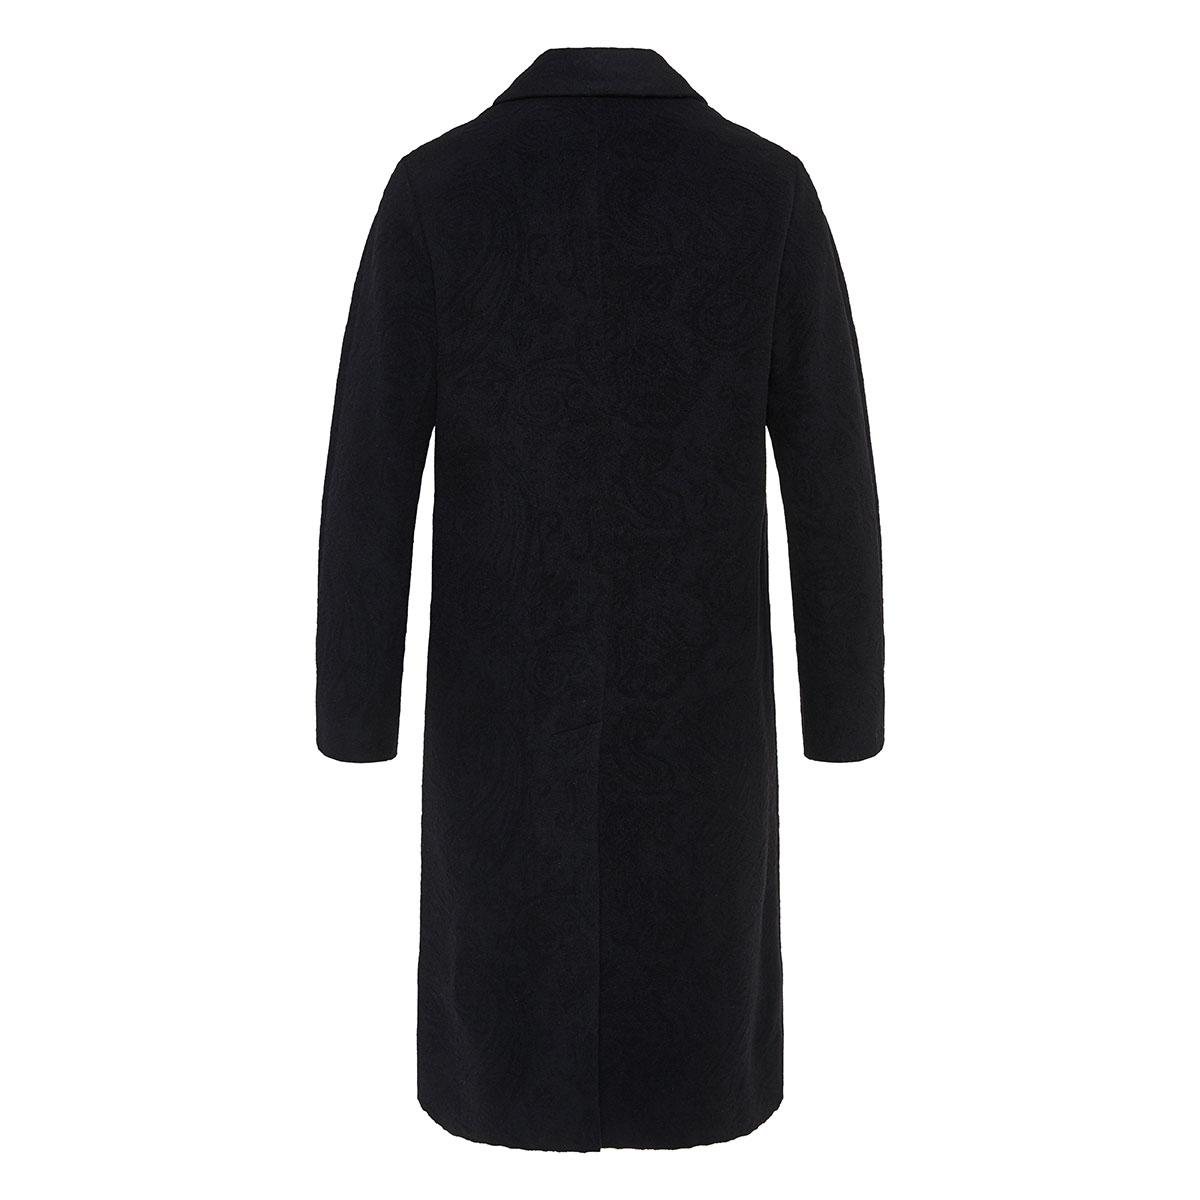 Oversized paisley wool coat